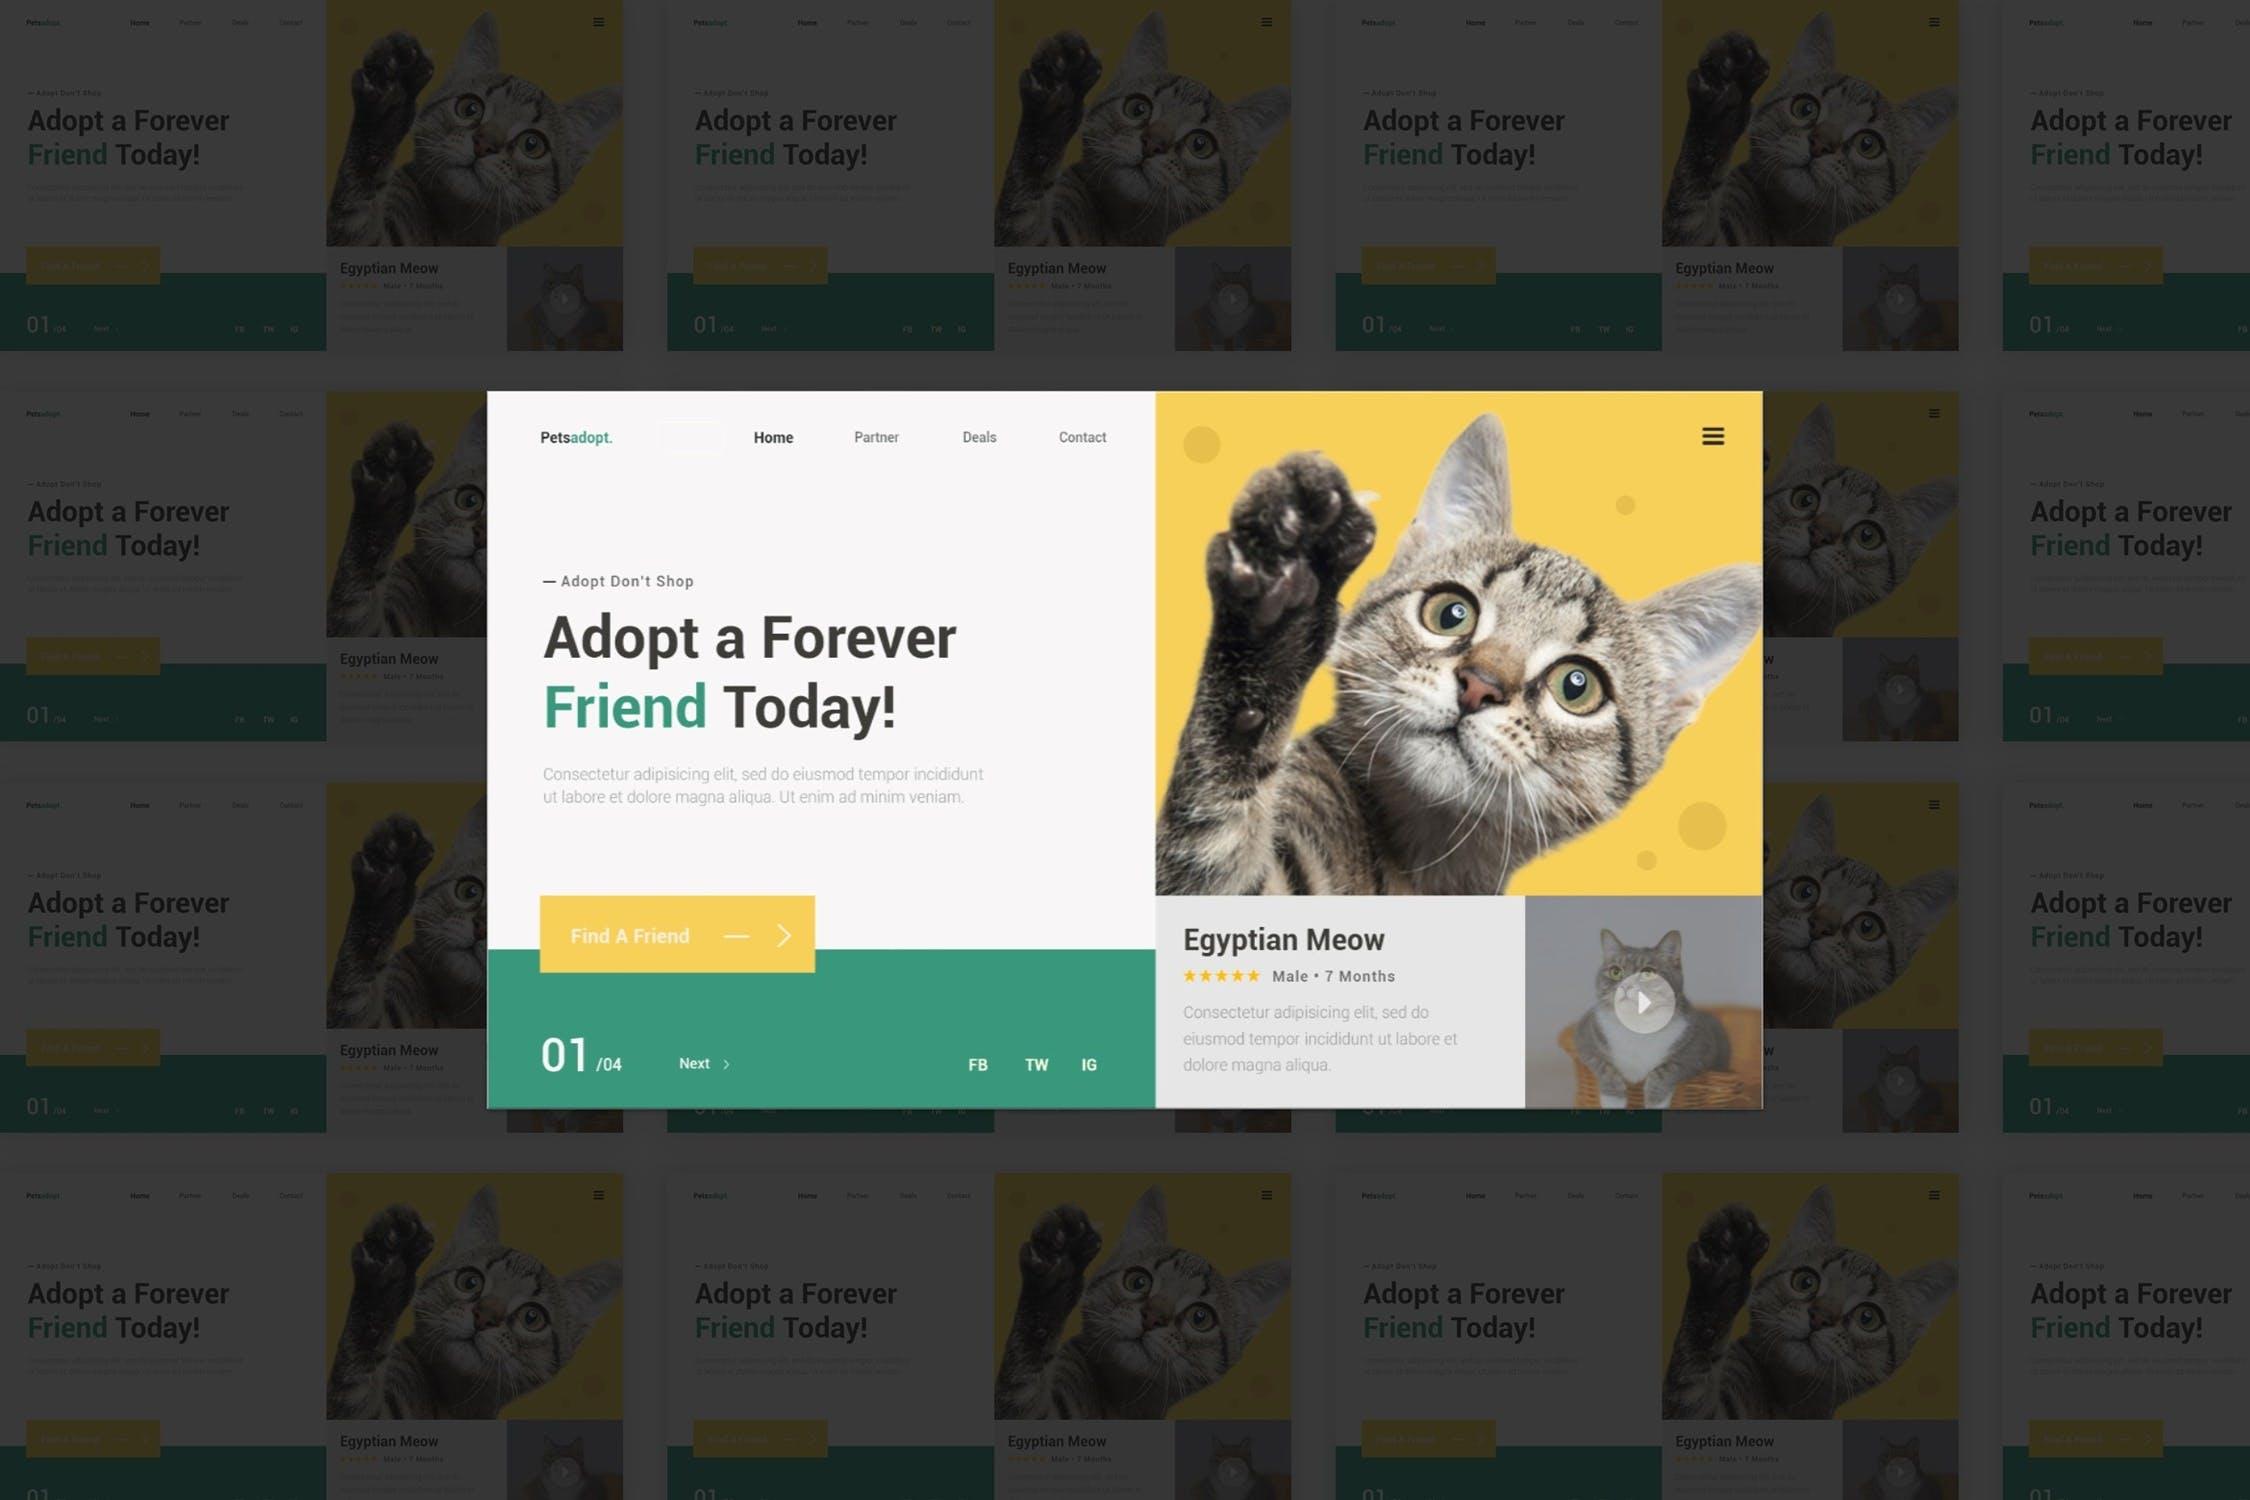 宠物官方网站Petsadopt Hero HeaderUI界面设计模板素材 designshidai_ui226